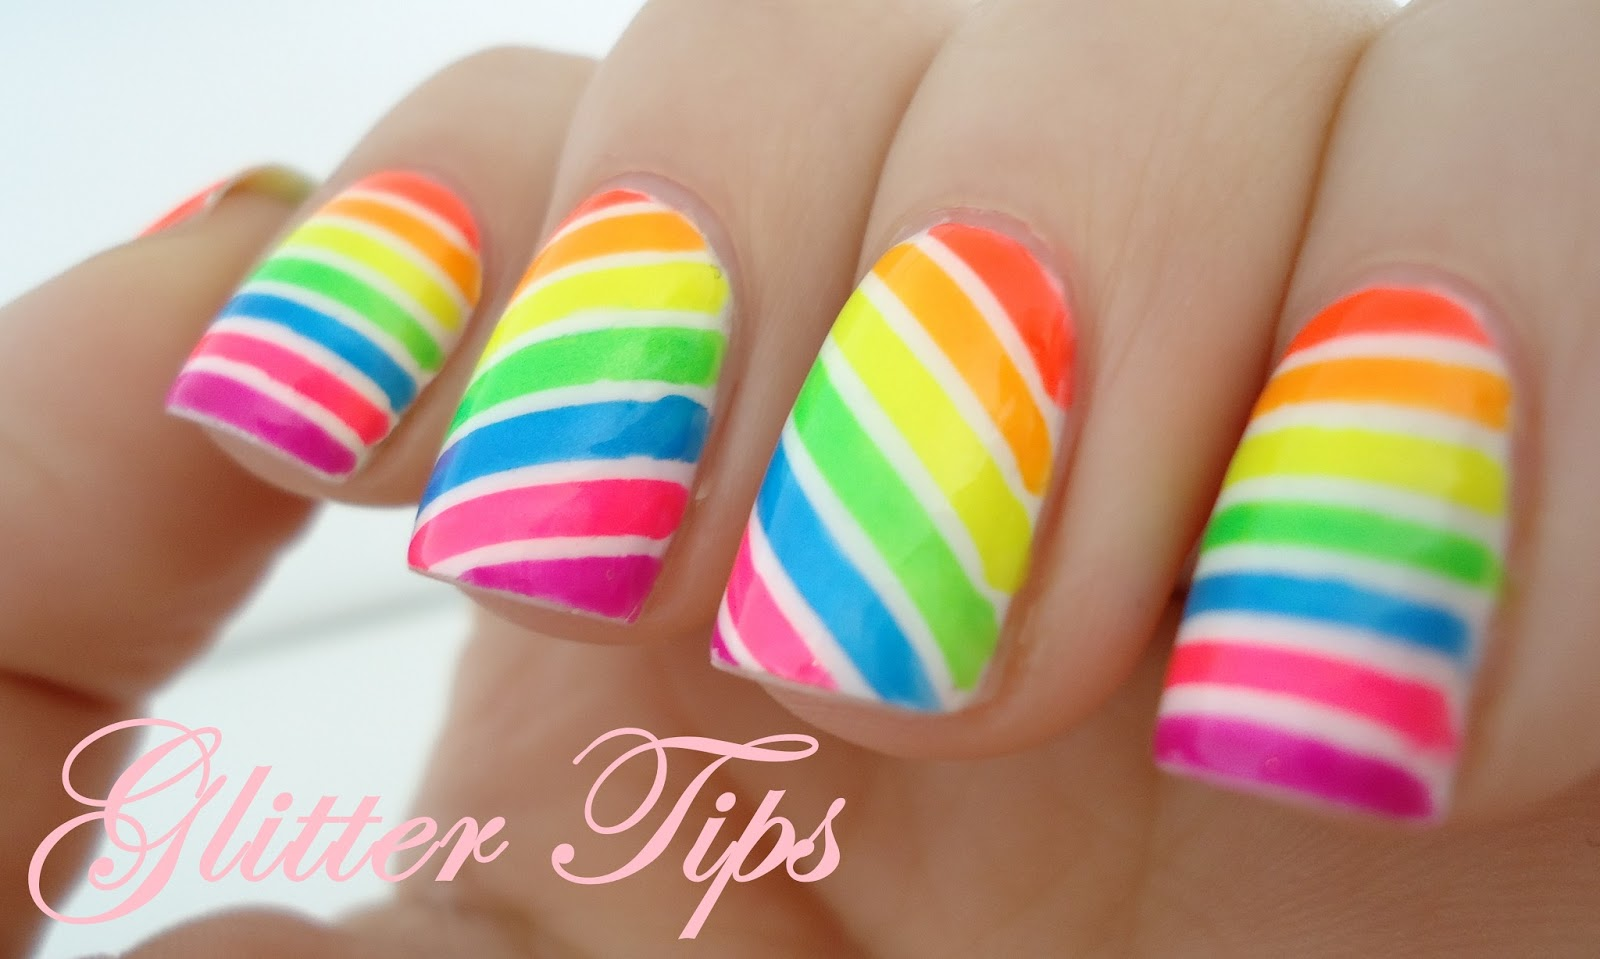 Glitter Tips: Neon Candy Stripes - Nail Art